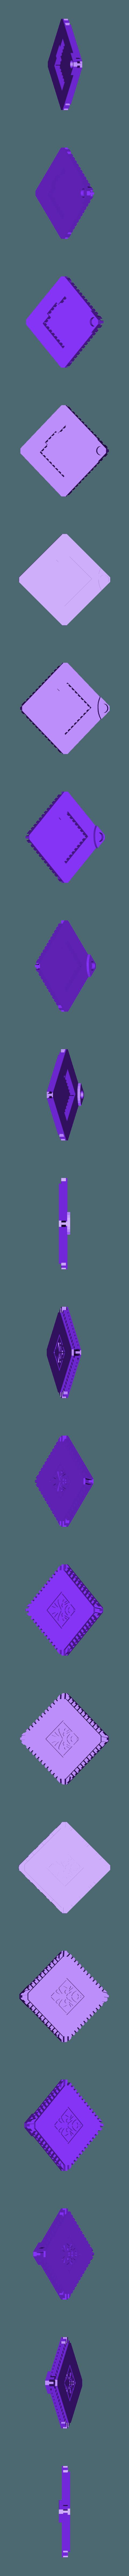 Pi_Omen_lid.stl Download free STL file Raspberry Pi 3 OMEN Accelerator Case • 3D printable object, Chaco